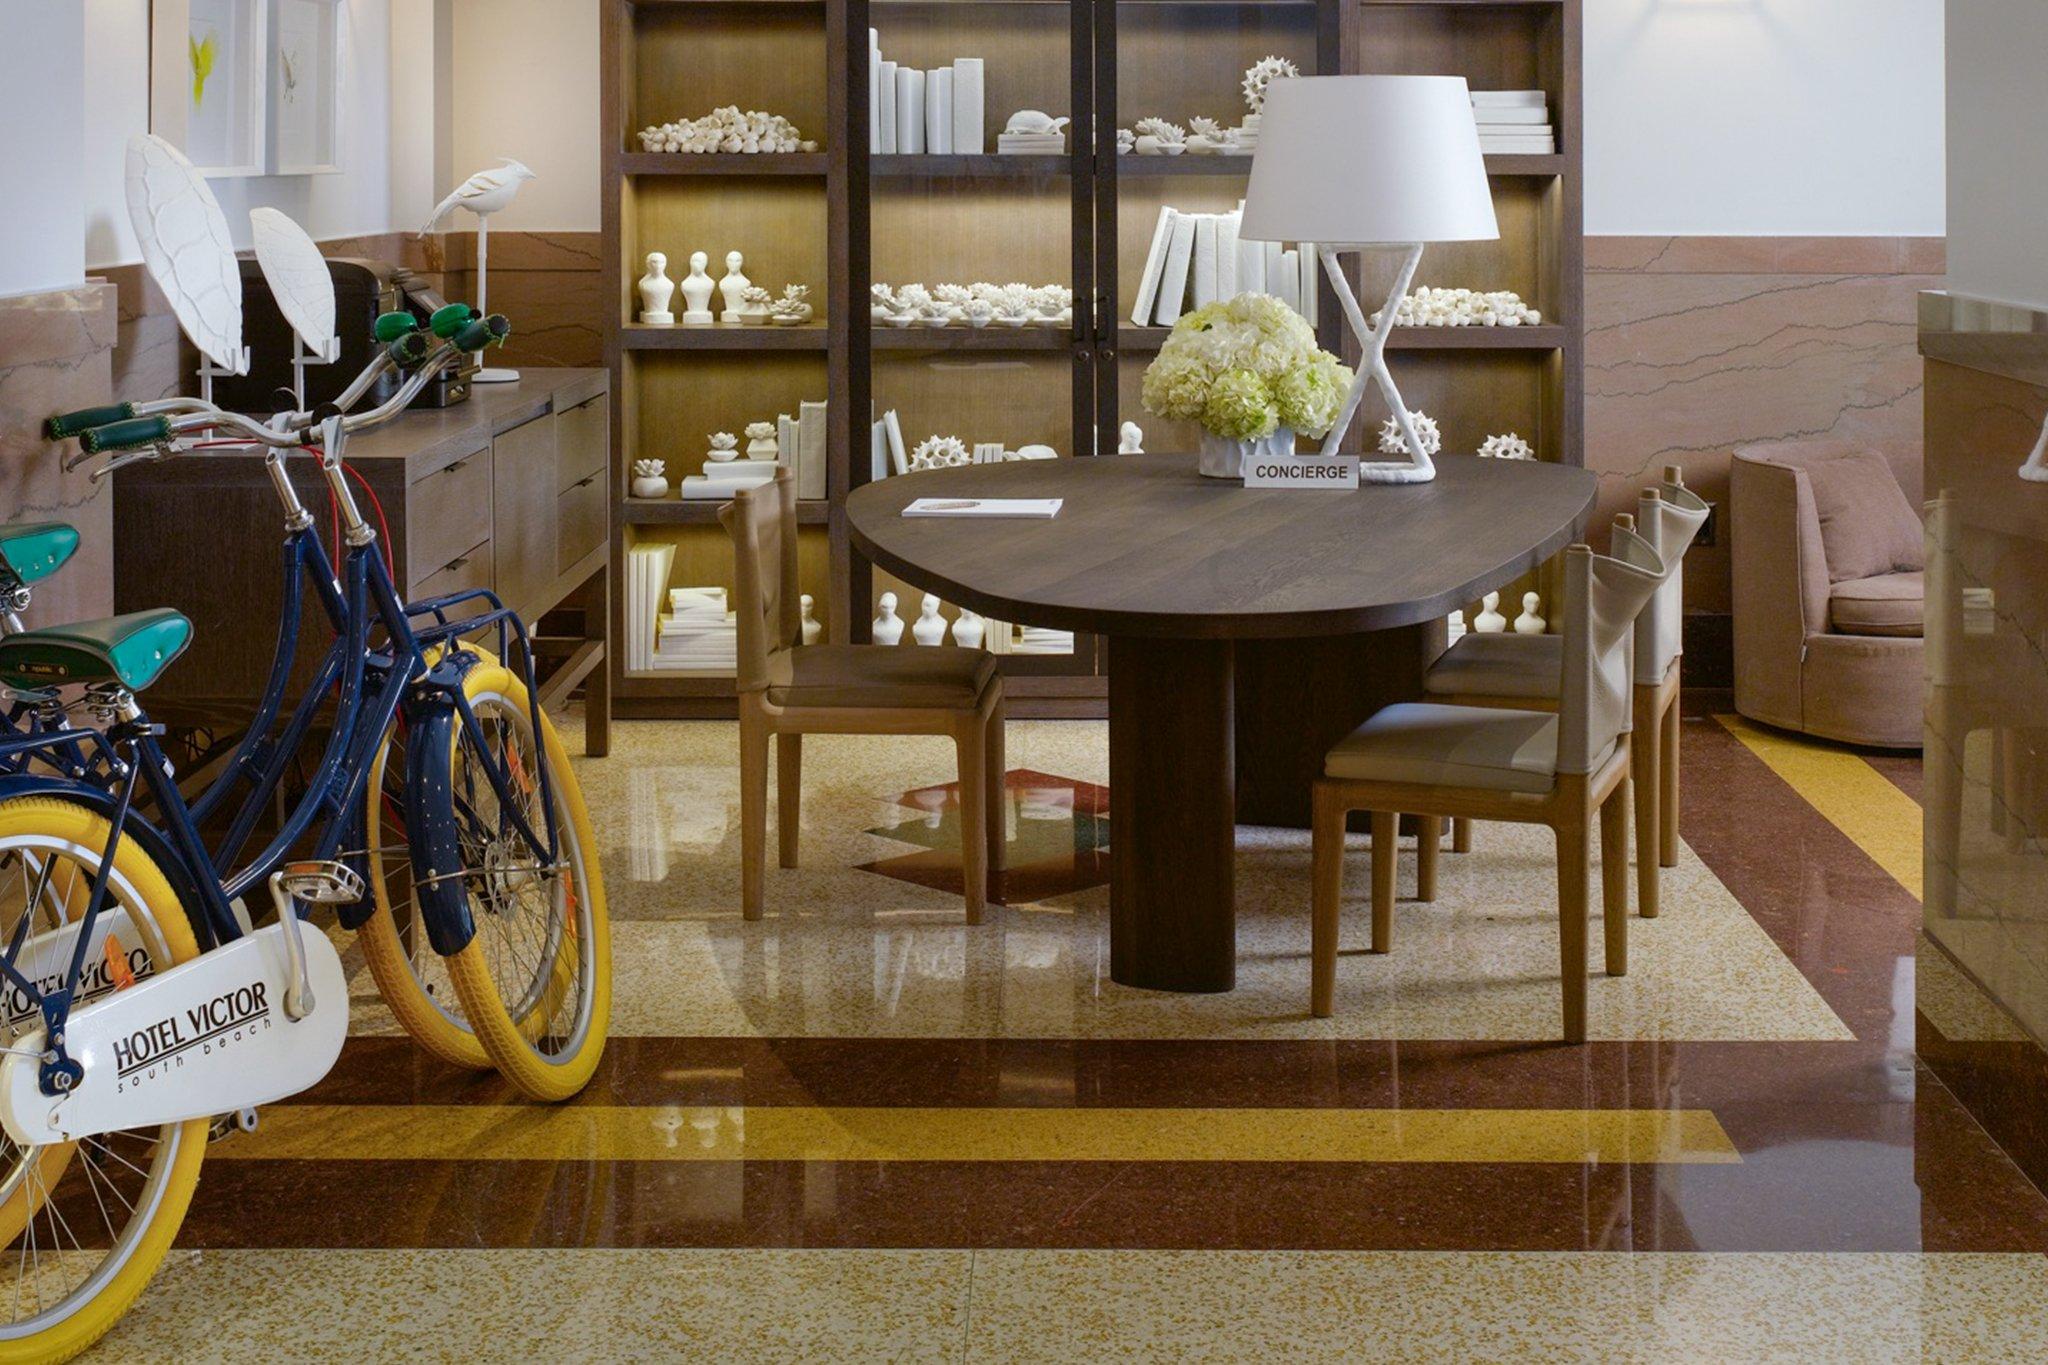 Hotel-Victor-Bikes